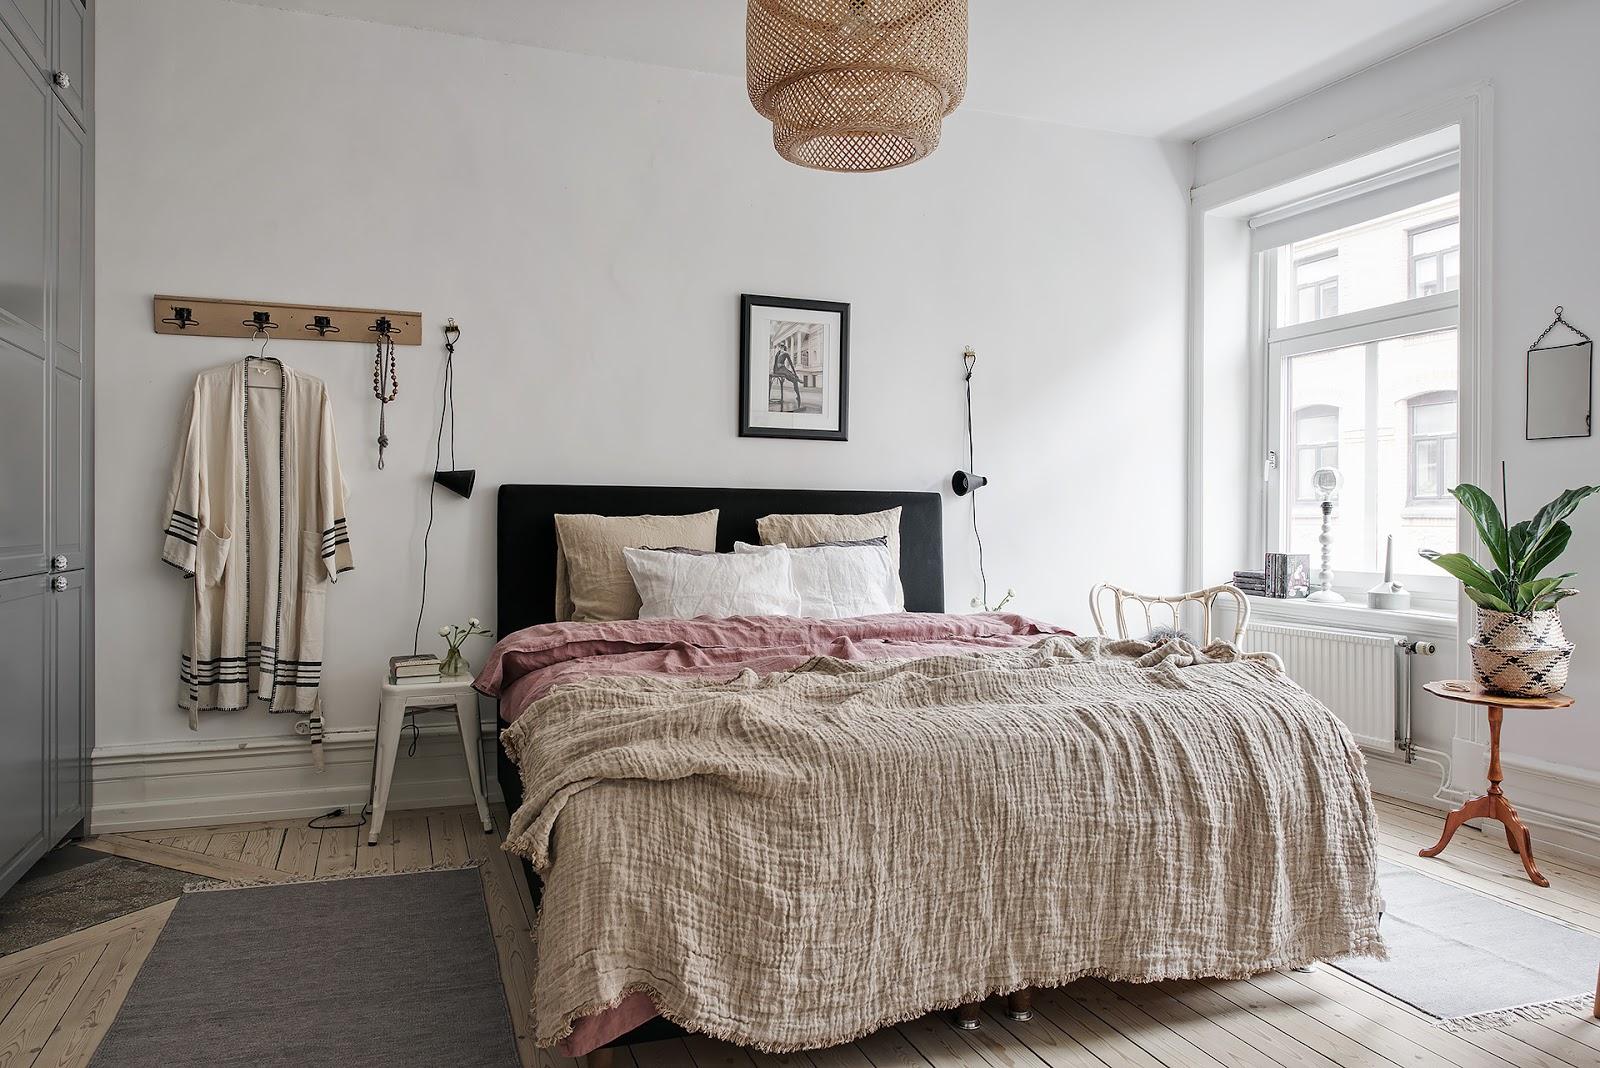 Textile și materiale naturale într-un apartament de 59 m²